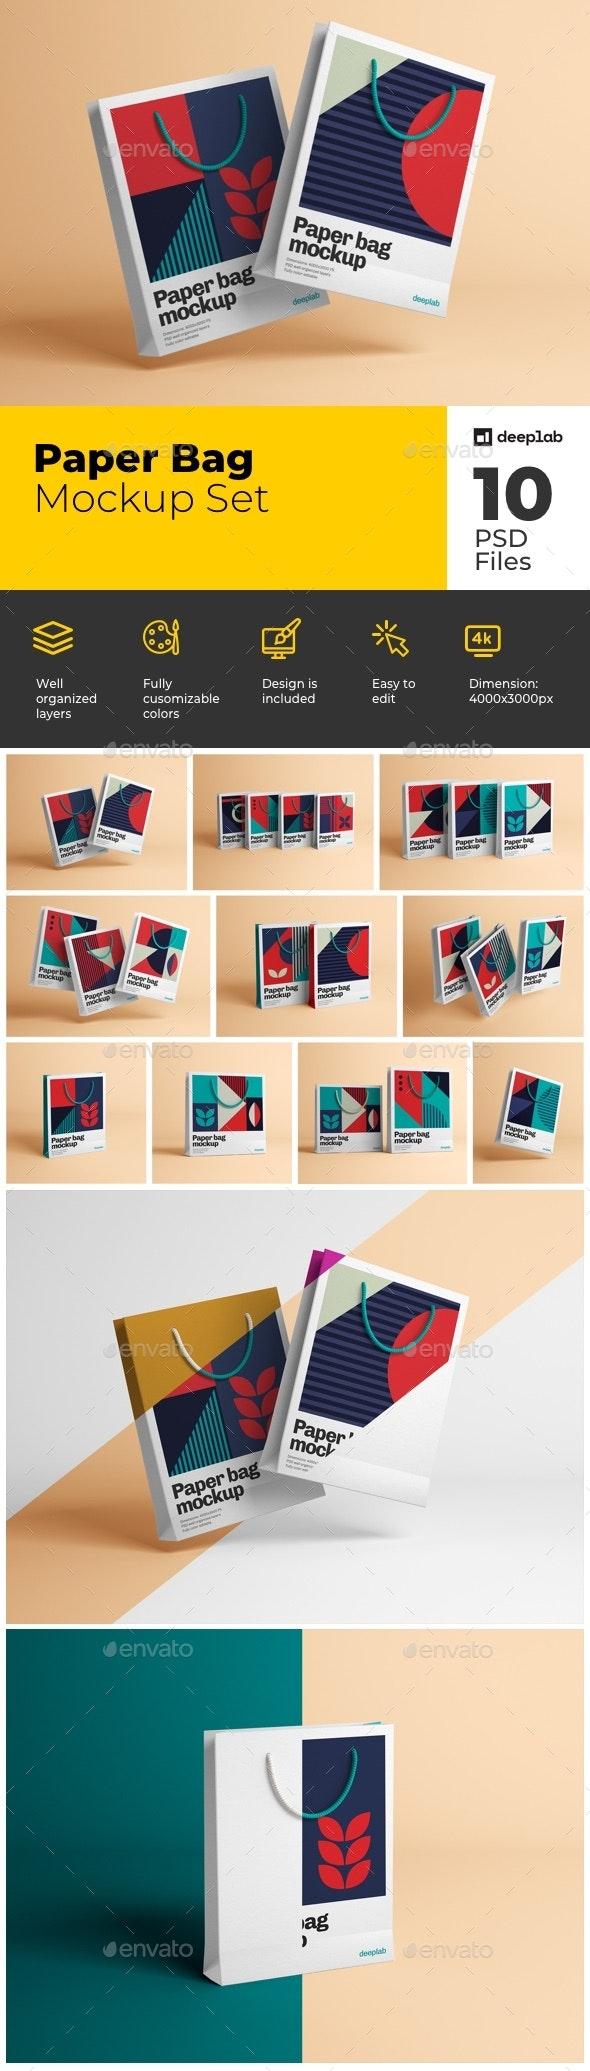 Paper Bag Mockup Set - Product Mock-Ups Graphics